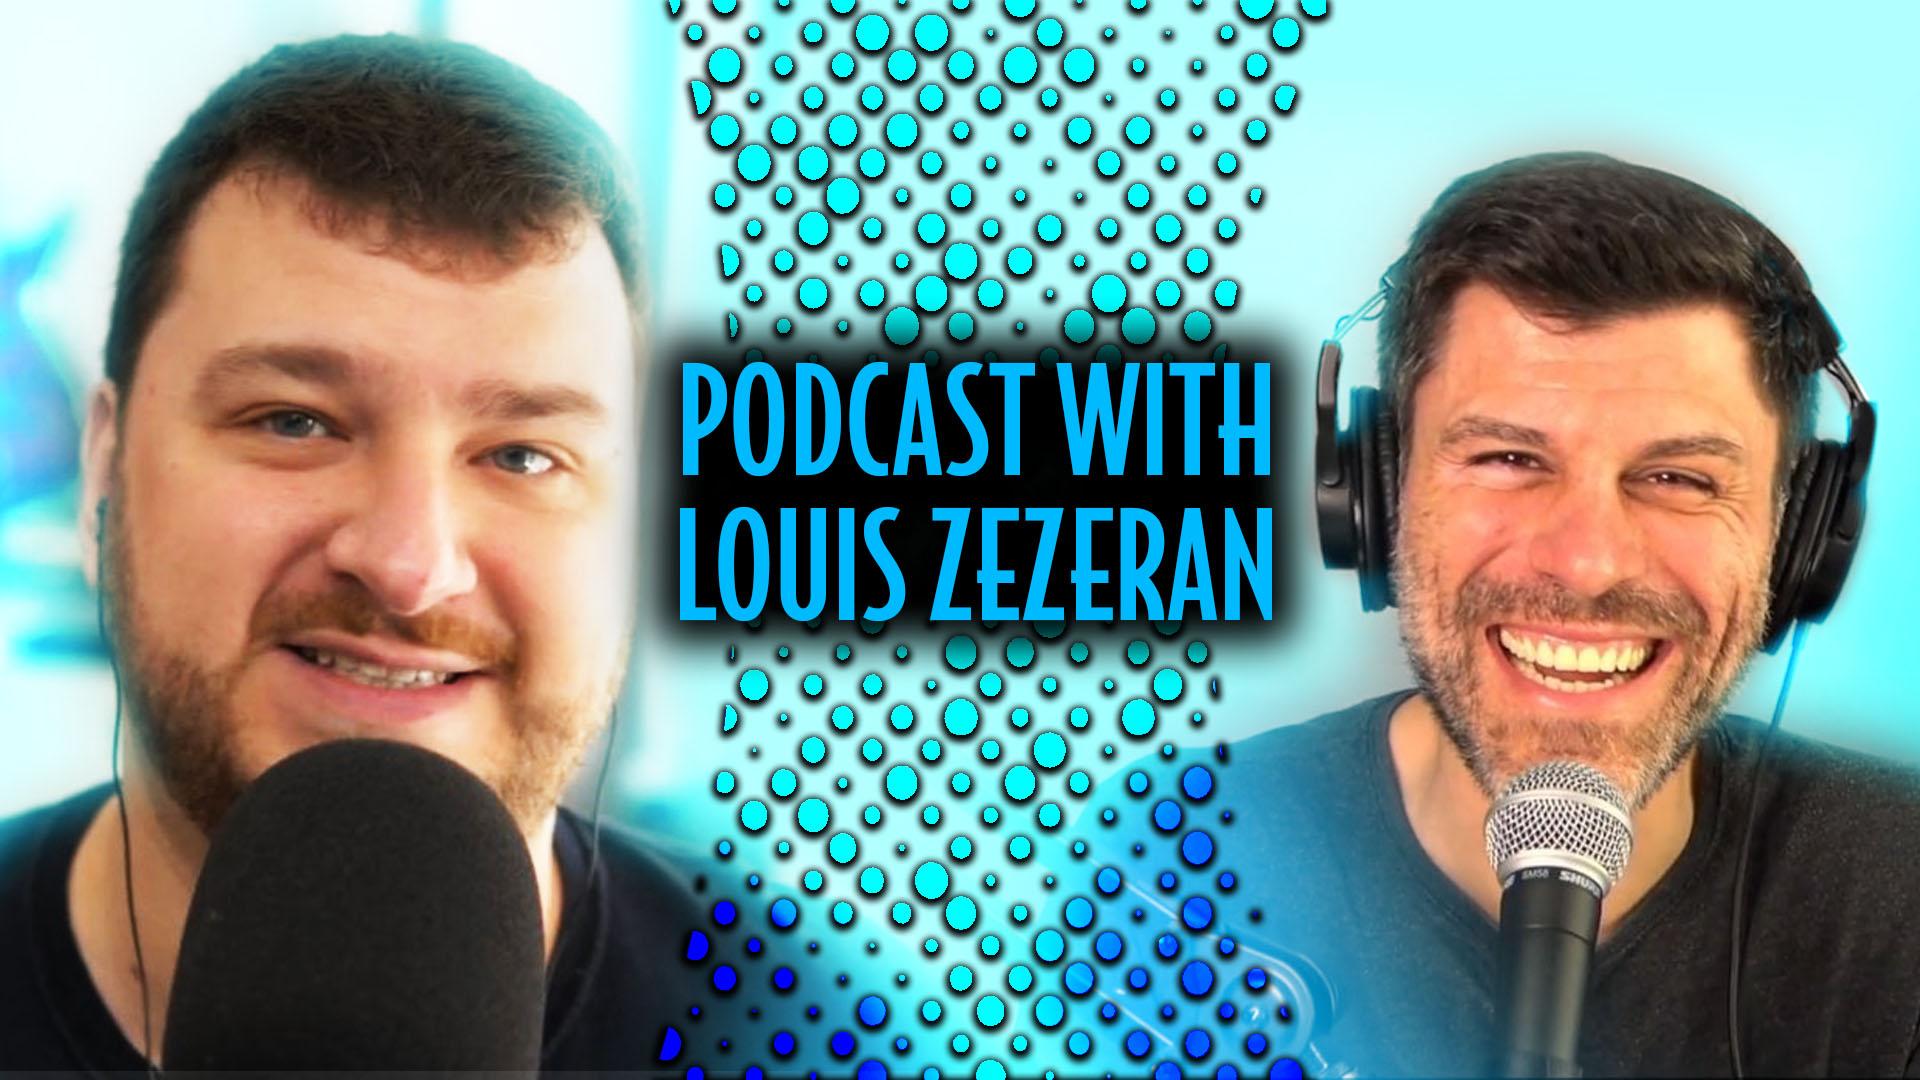 Podcast With Louis Zezeran